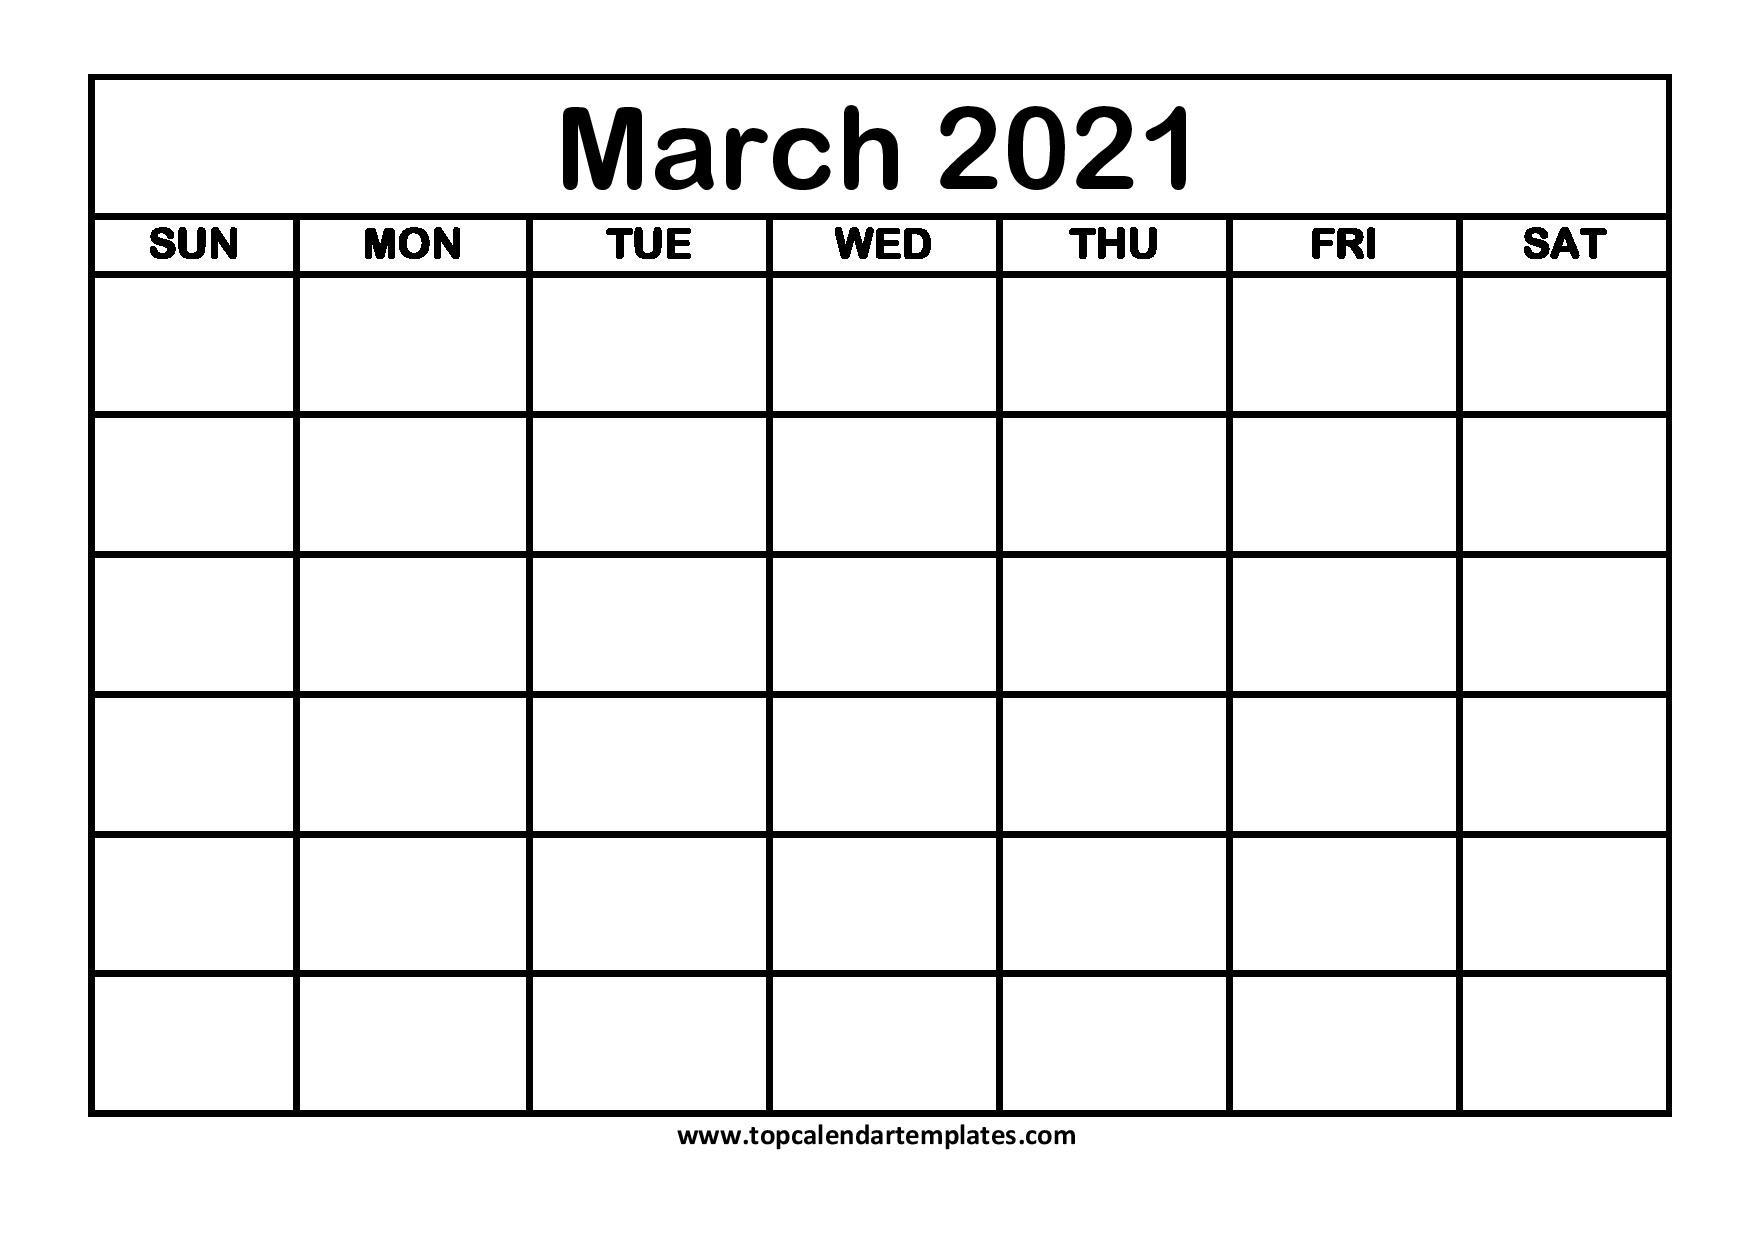 Free March 2021 Calendar Printable (Pdf, Word) Templates  Printable March 2021 Calendar Pdf